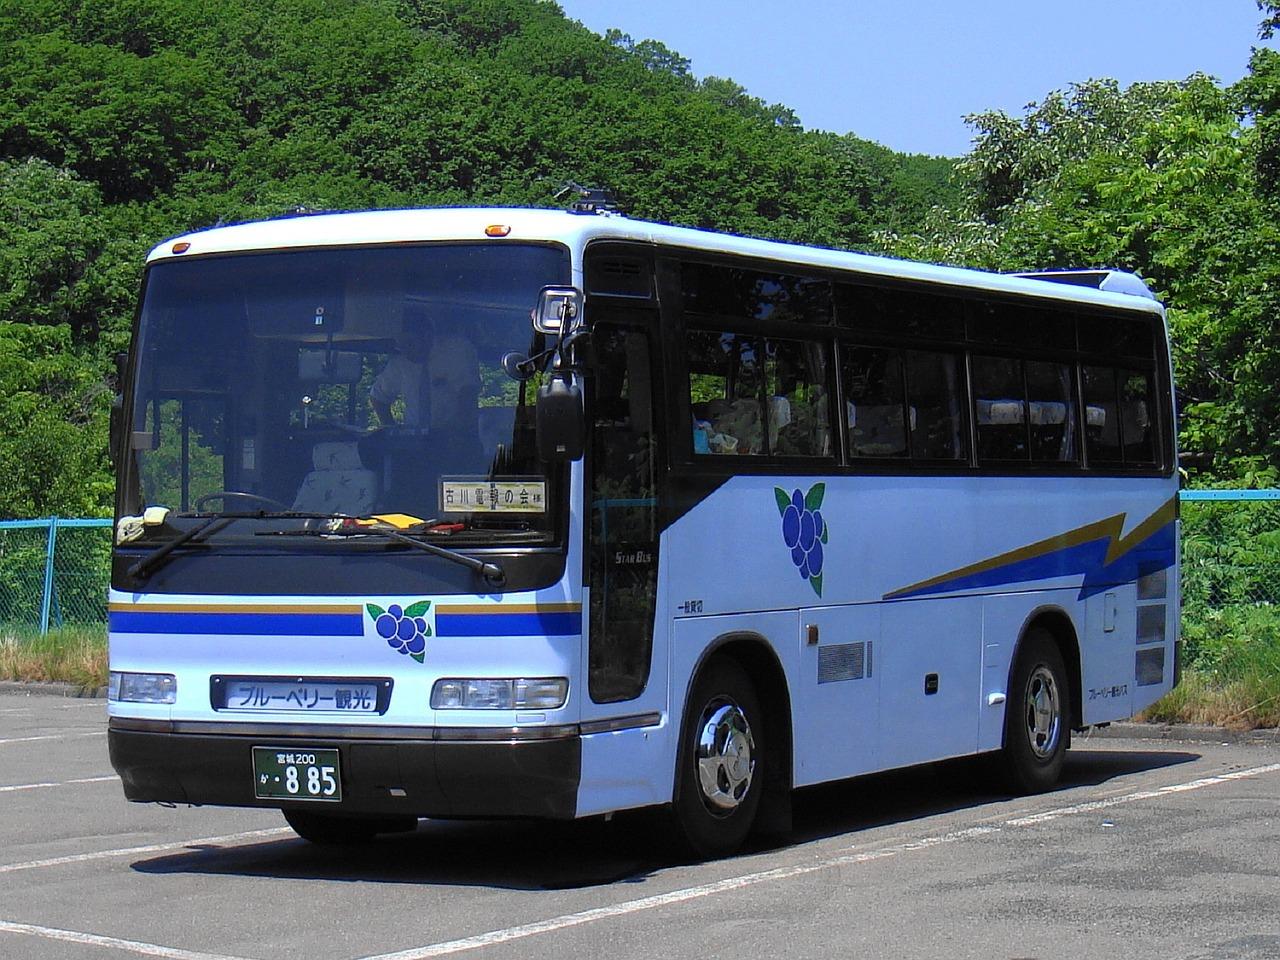 bus-712998_1280_1556746365361.jpg